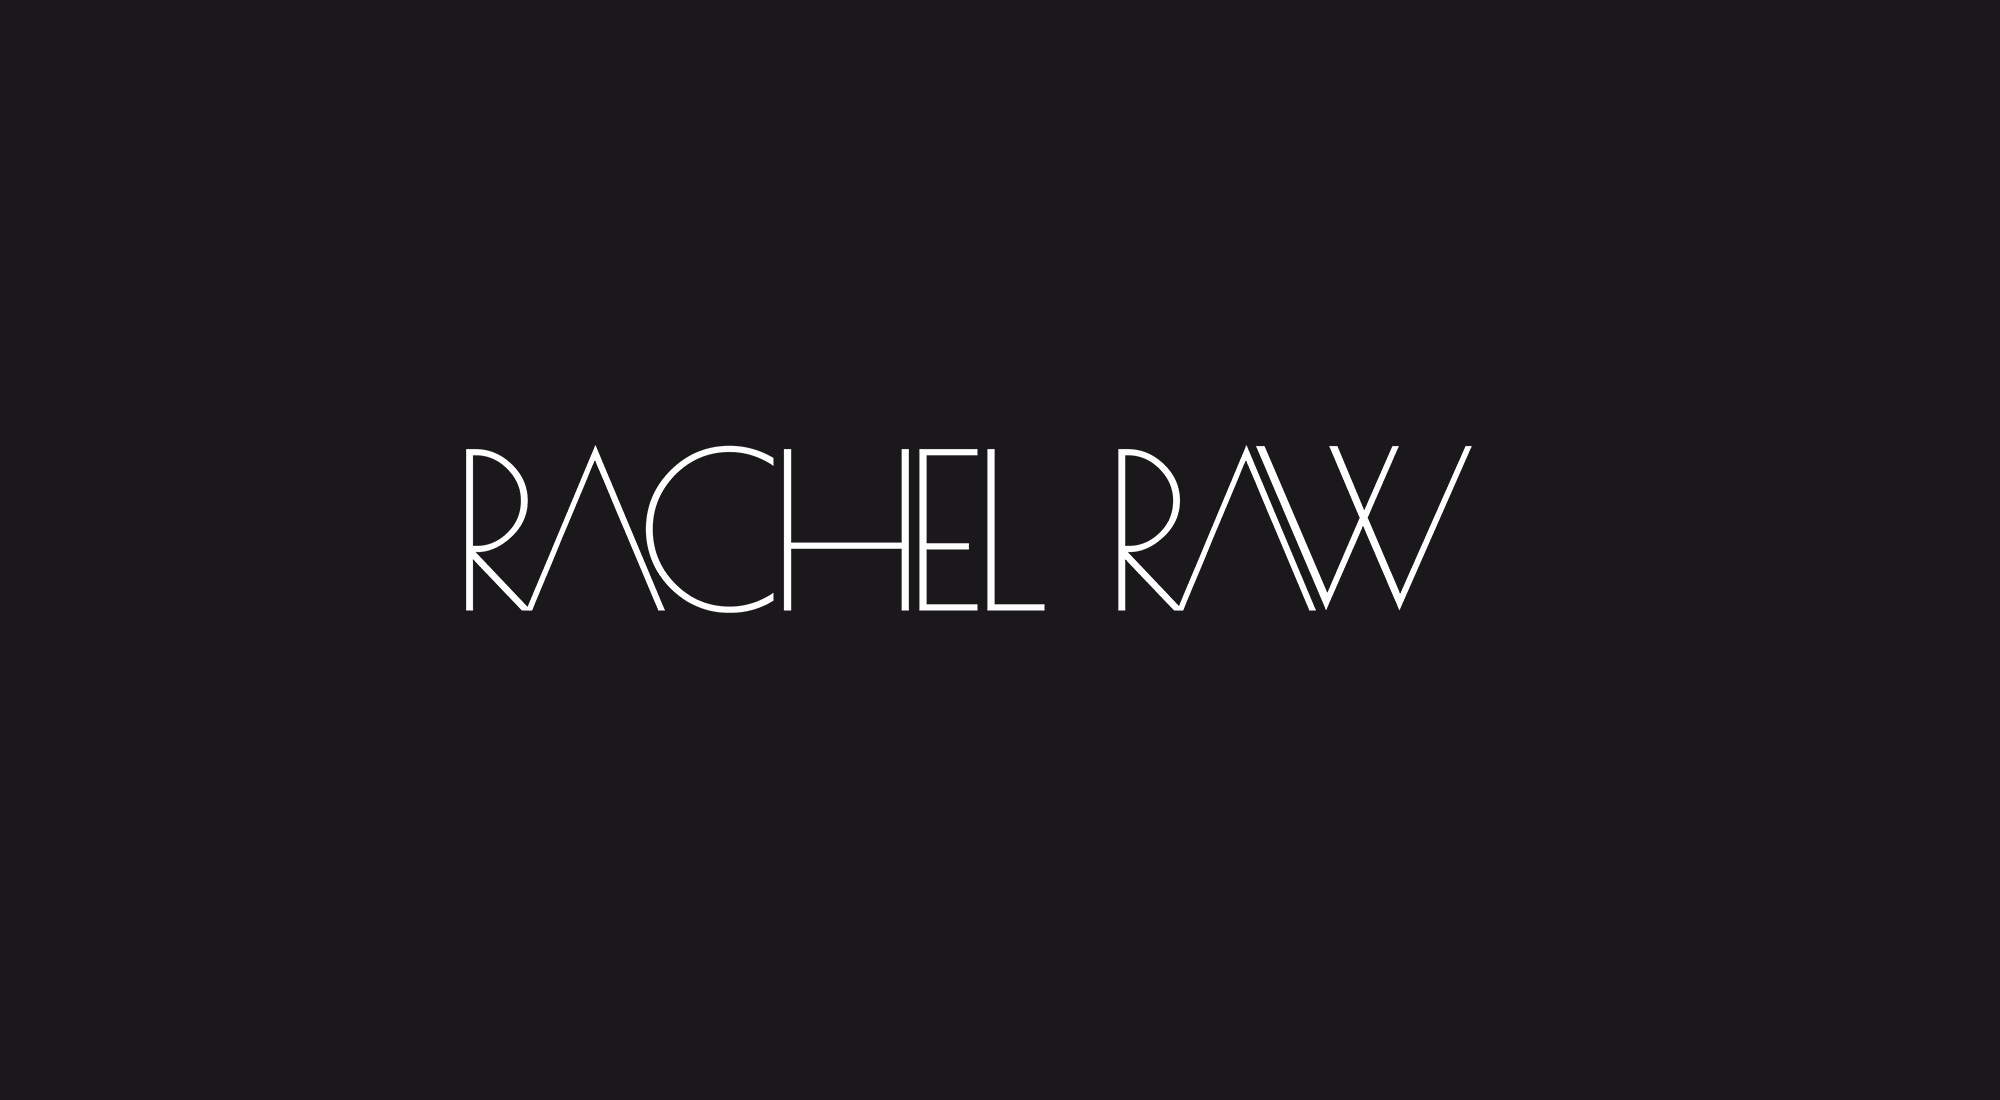 Rachel Raw